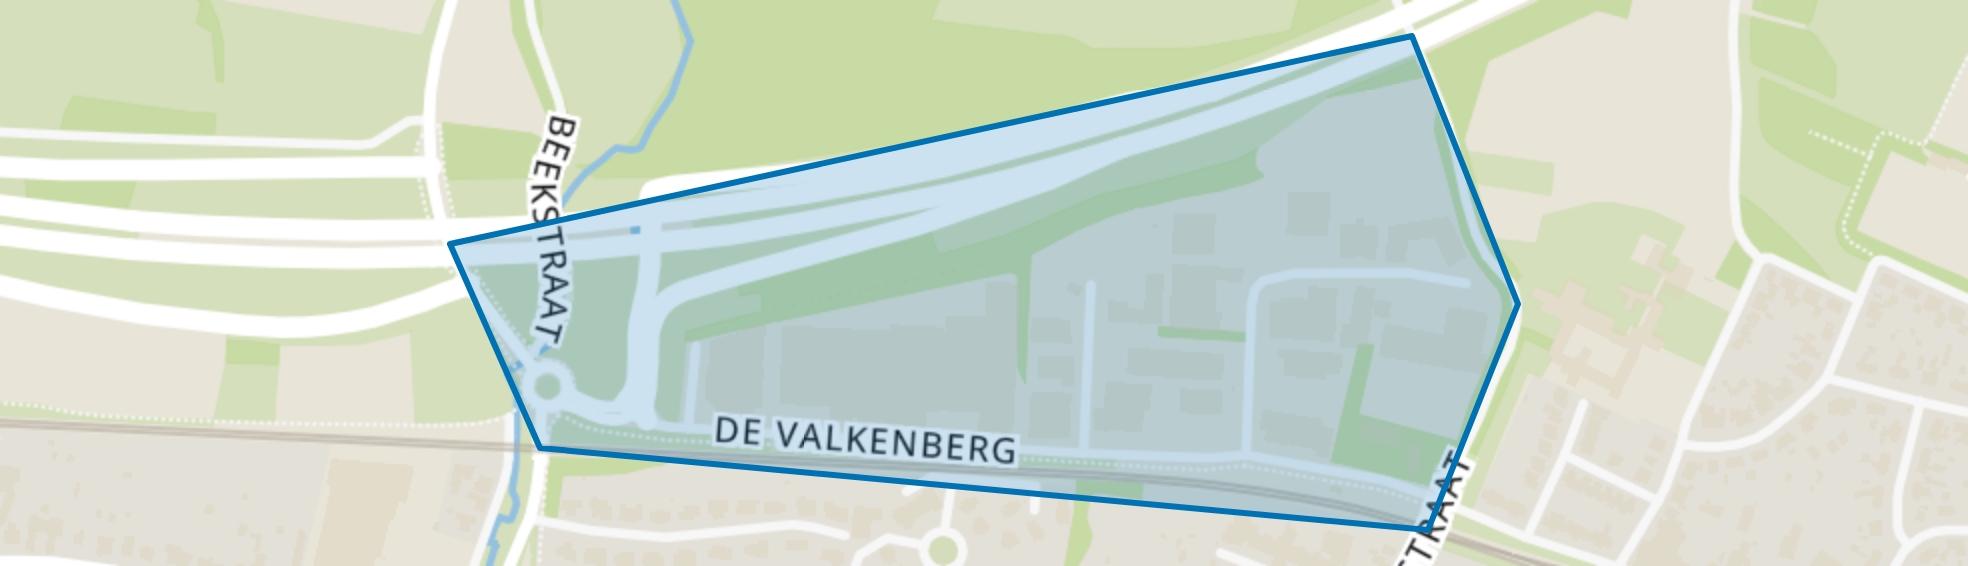 De Valkenberg, Valkenburg (LI) map